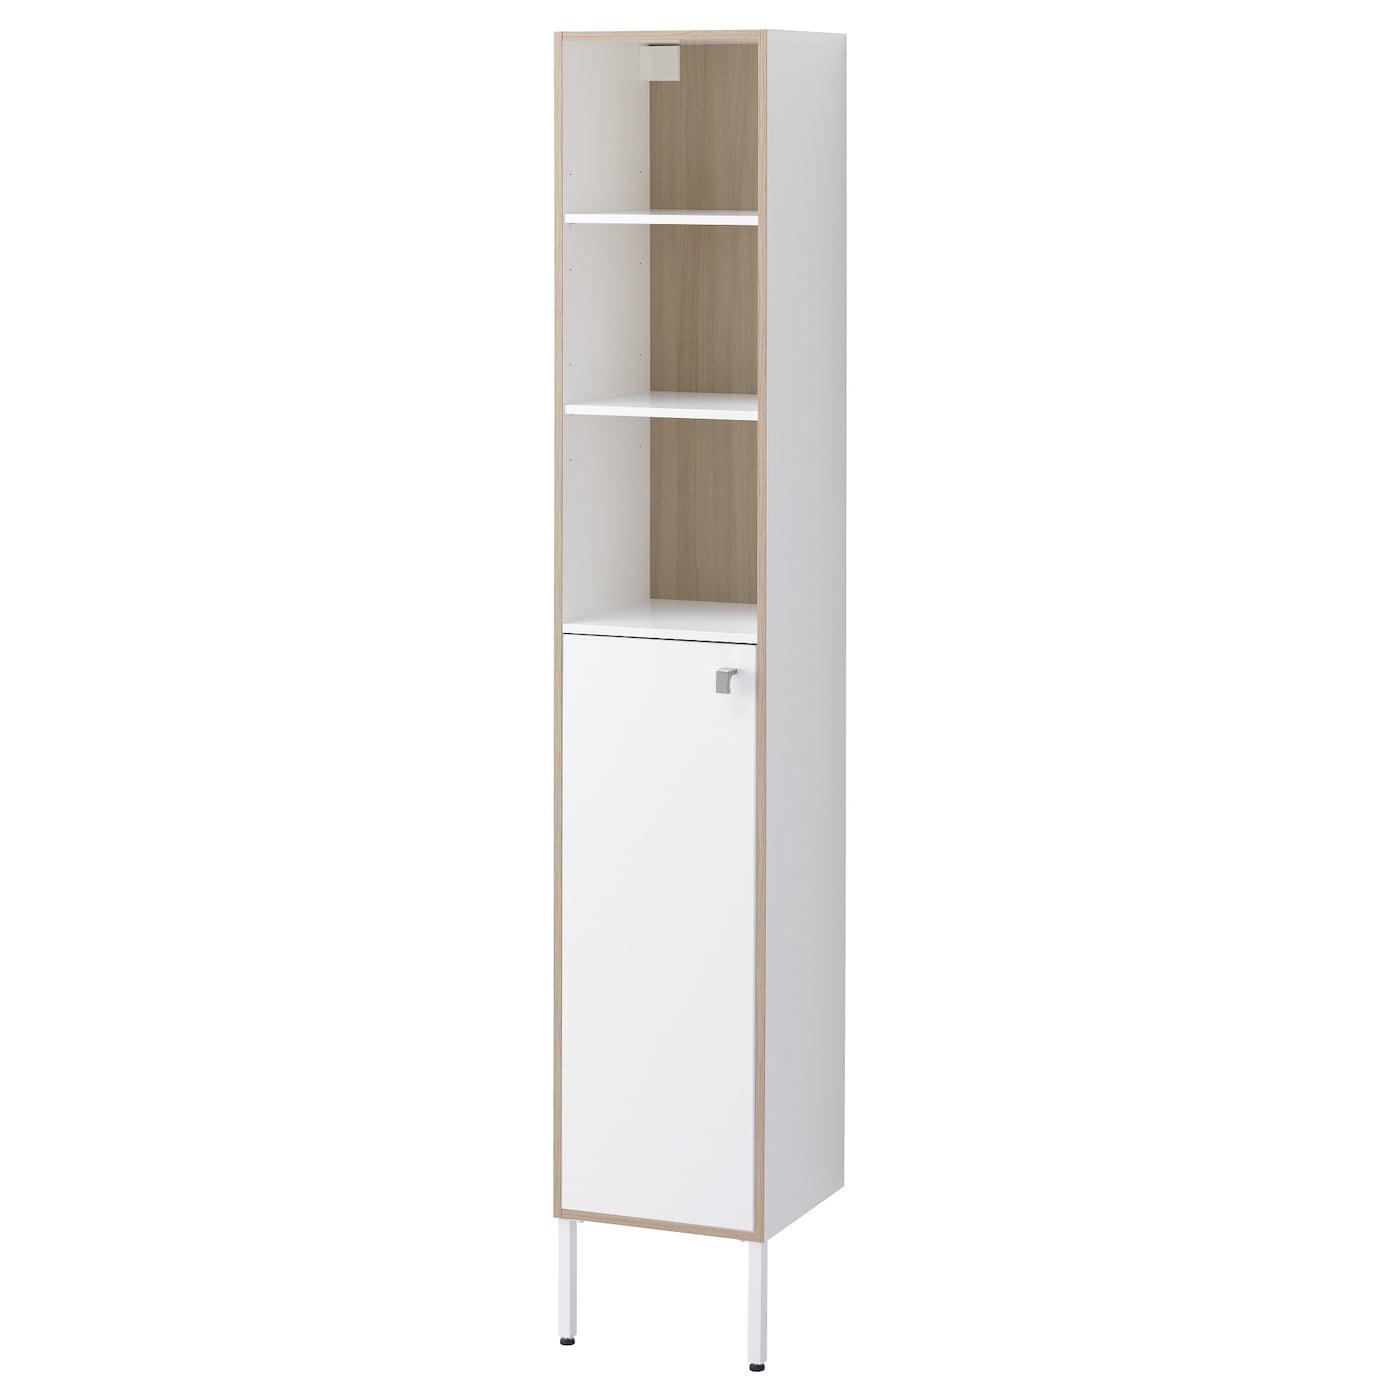 bathroom cabinets storage furniture ikea ireland dublin